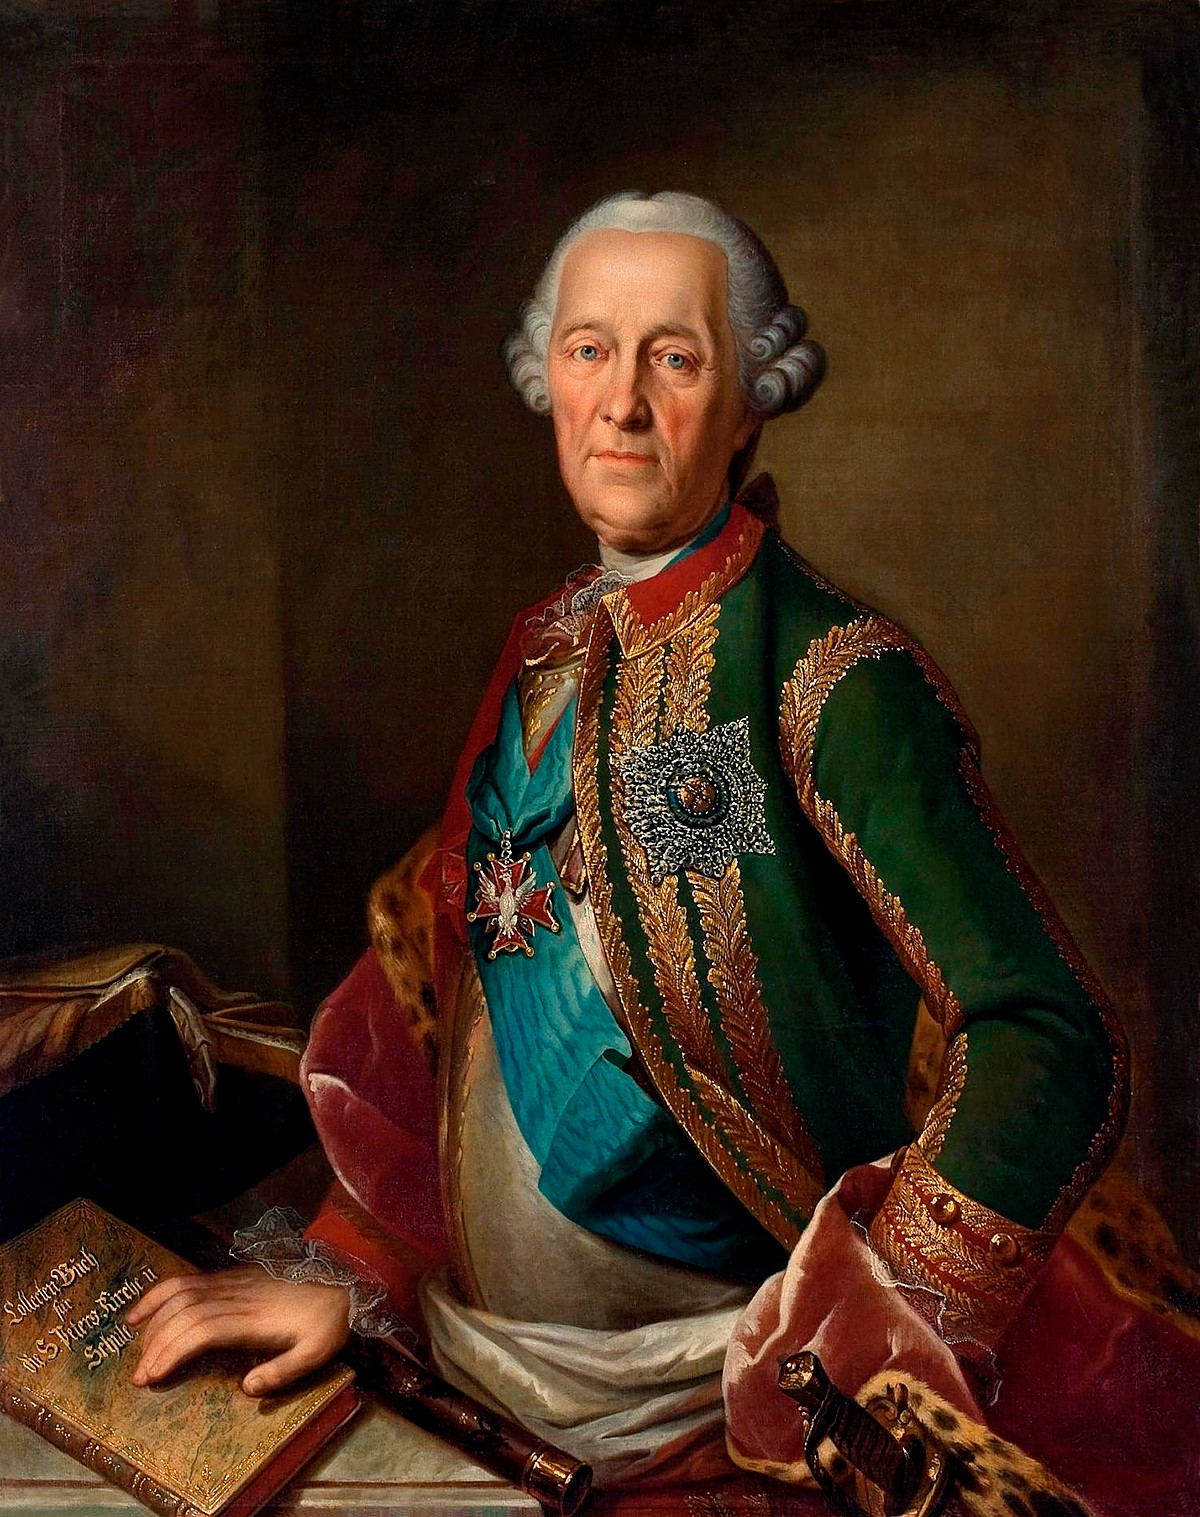 Портрет на граф Мюних Хайнрих Бухолц